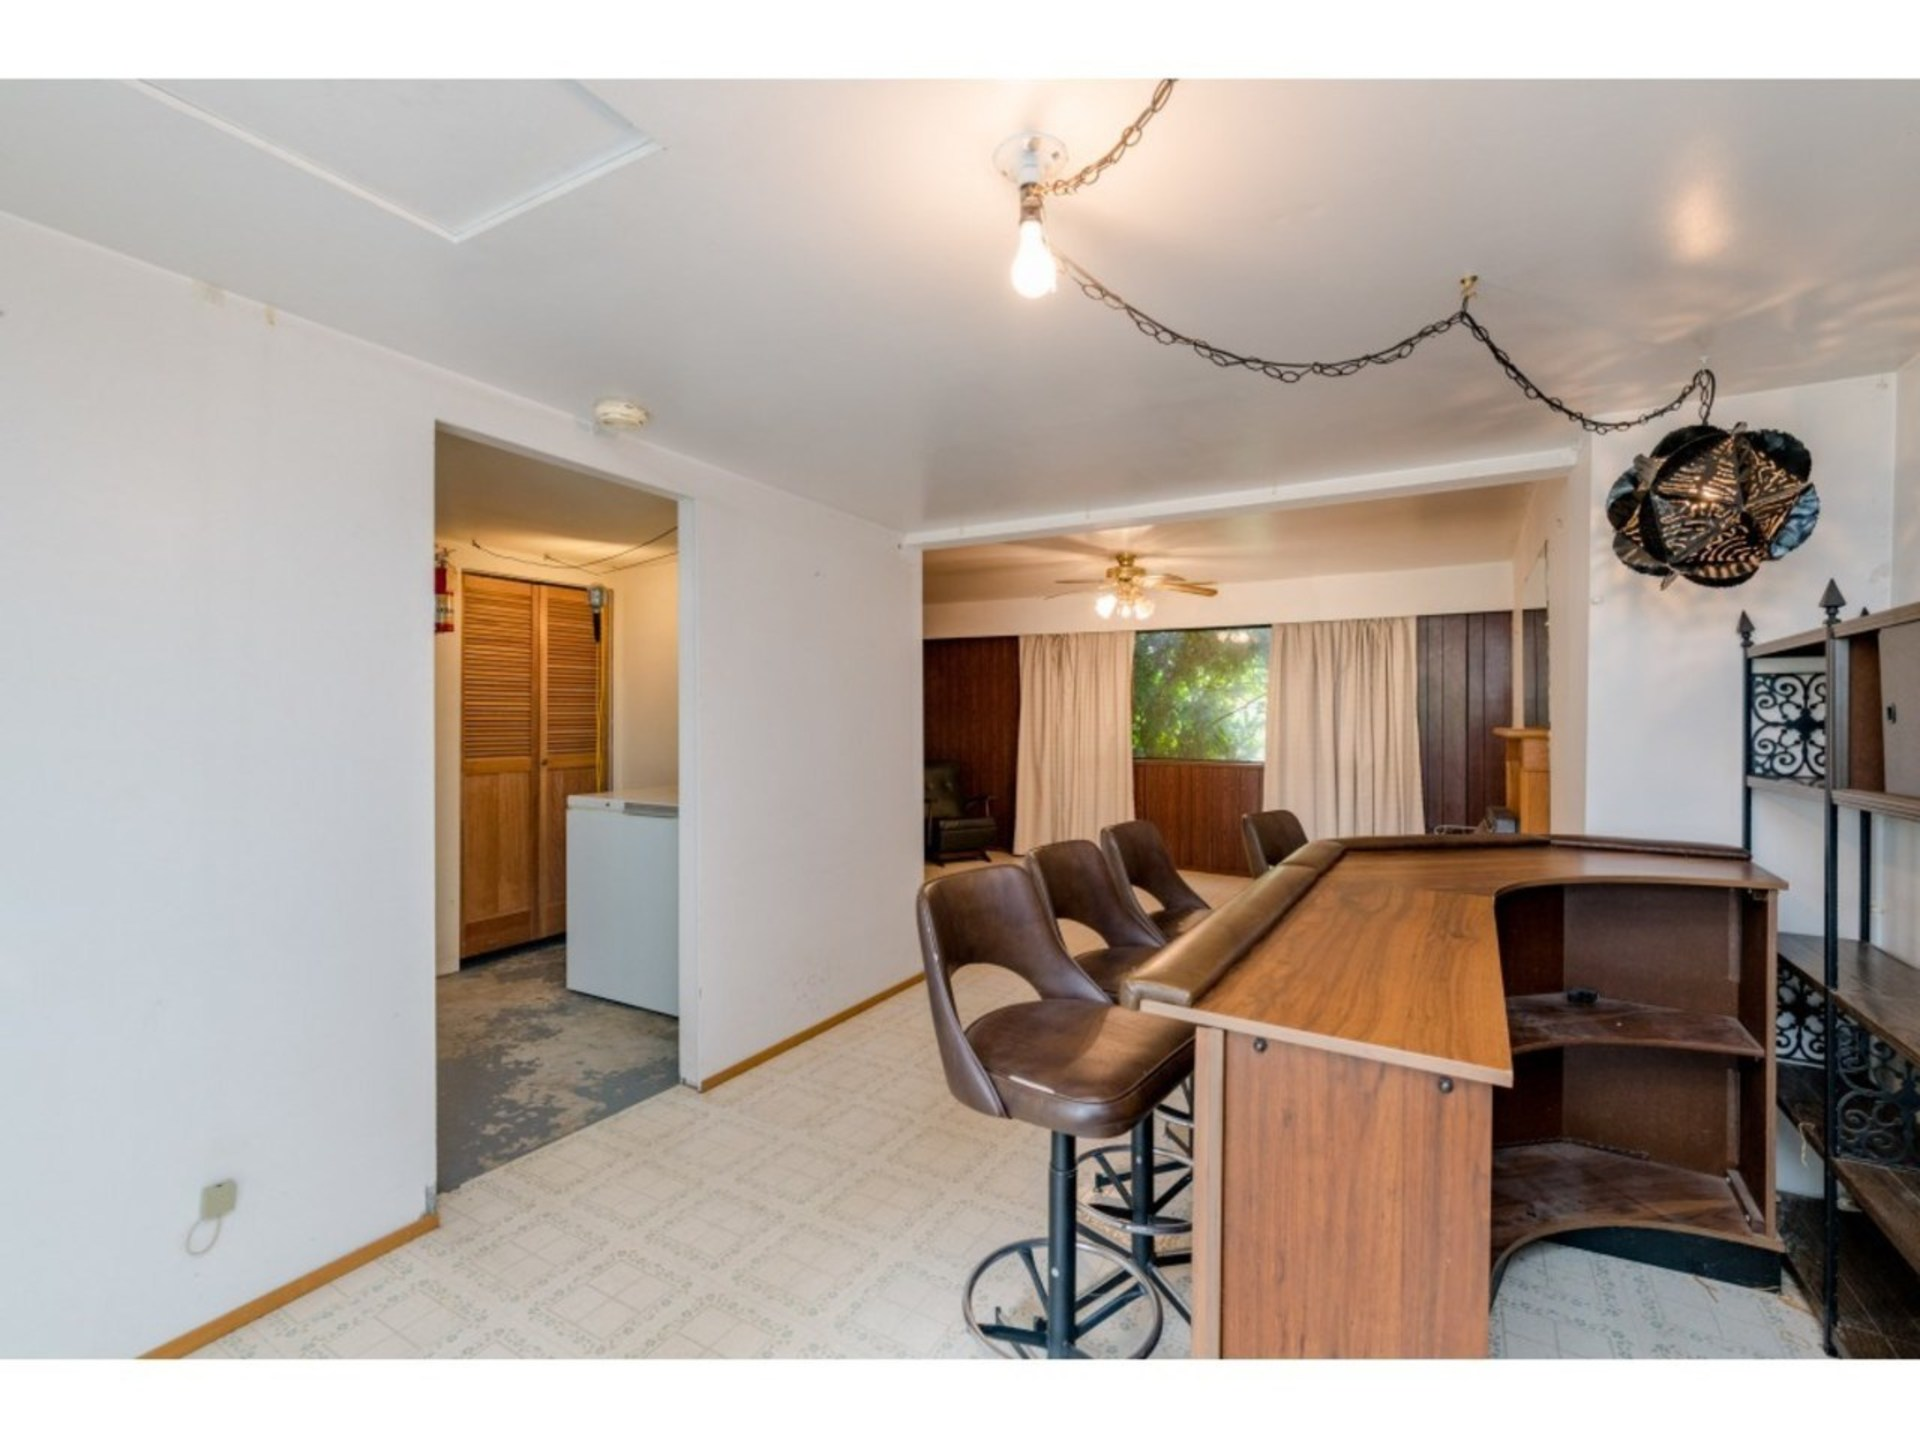 5771-172-street-cloverdale-bc-cloverdale-13 at 5771 172 Street, Cloverdale BC, Cloverdale